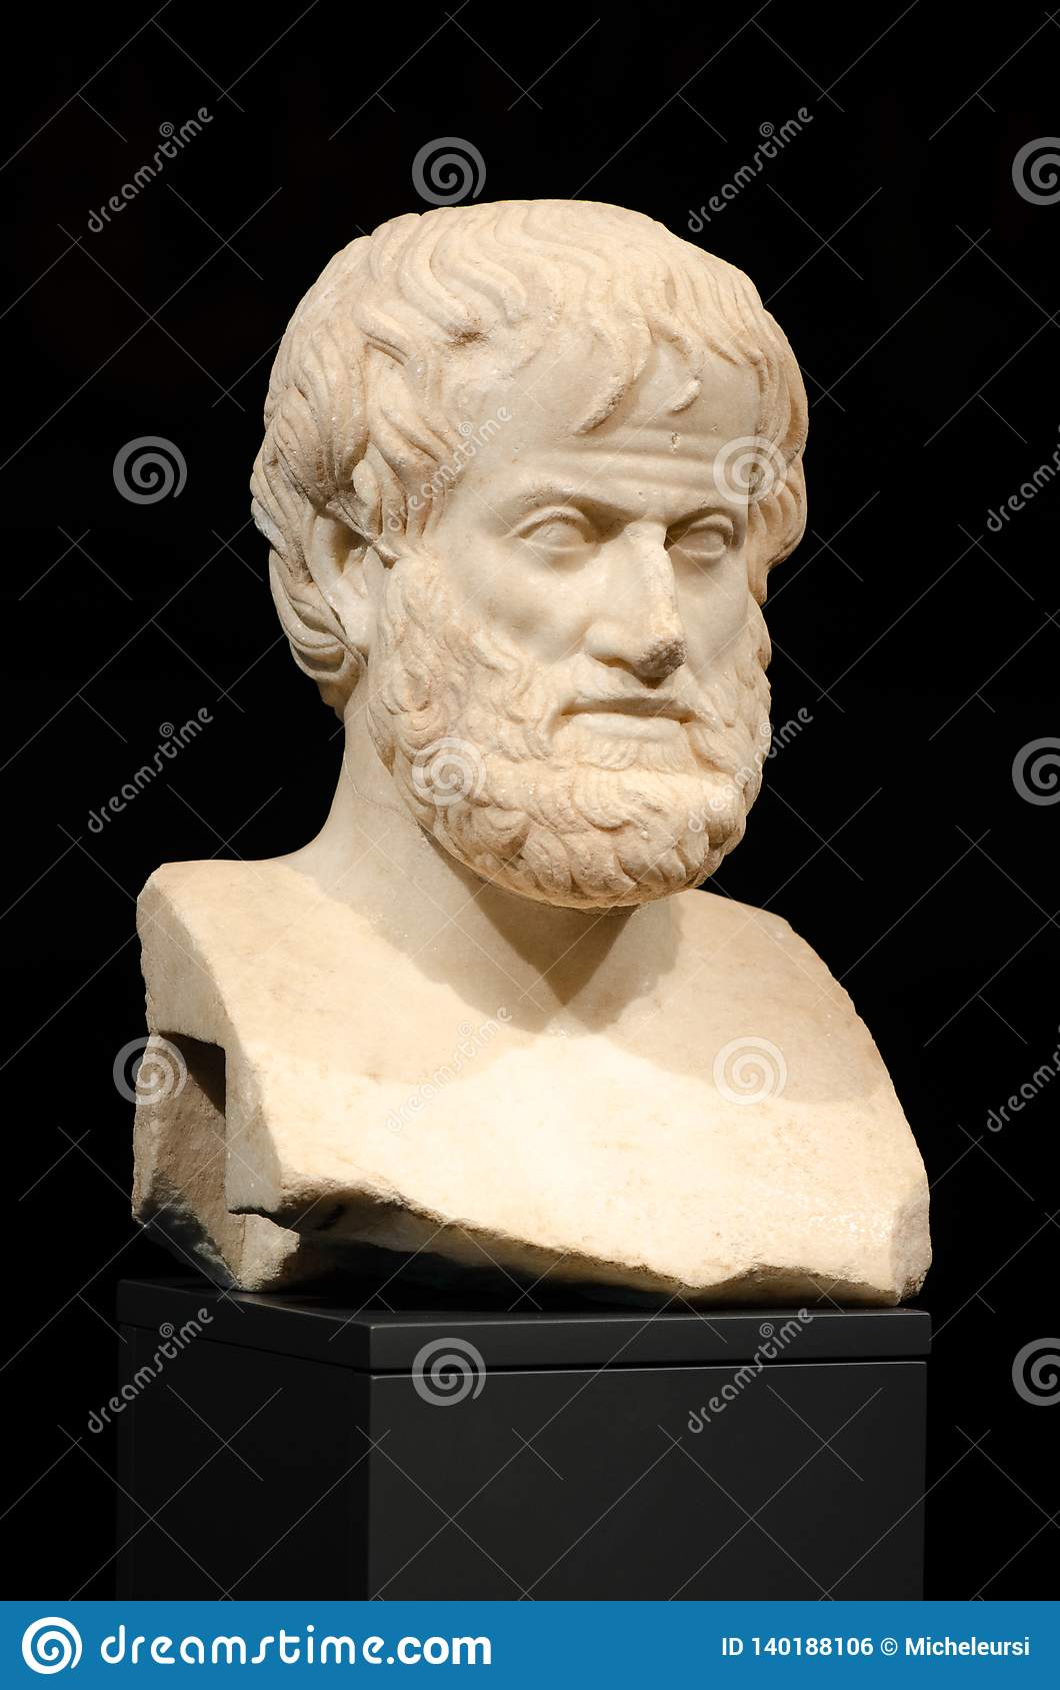 Philosophy. Aristotle